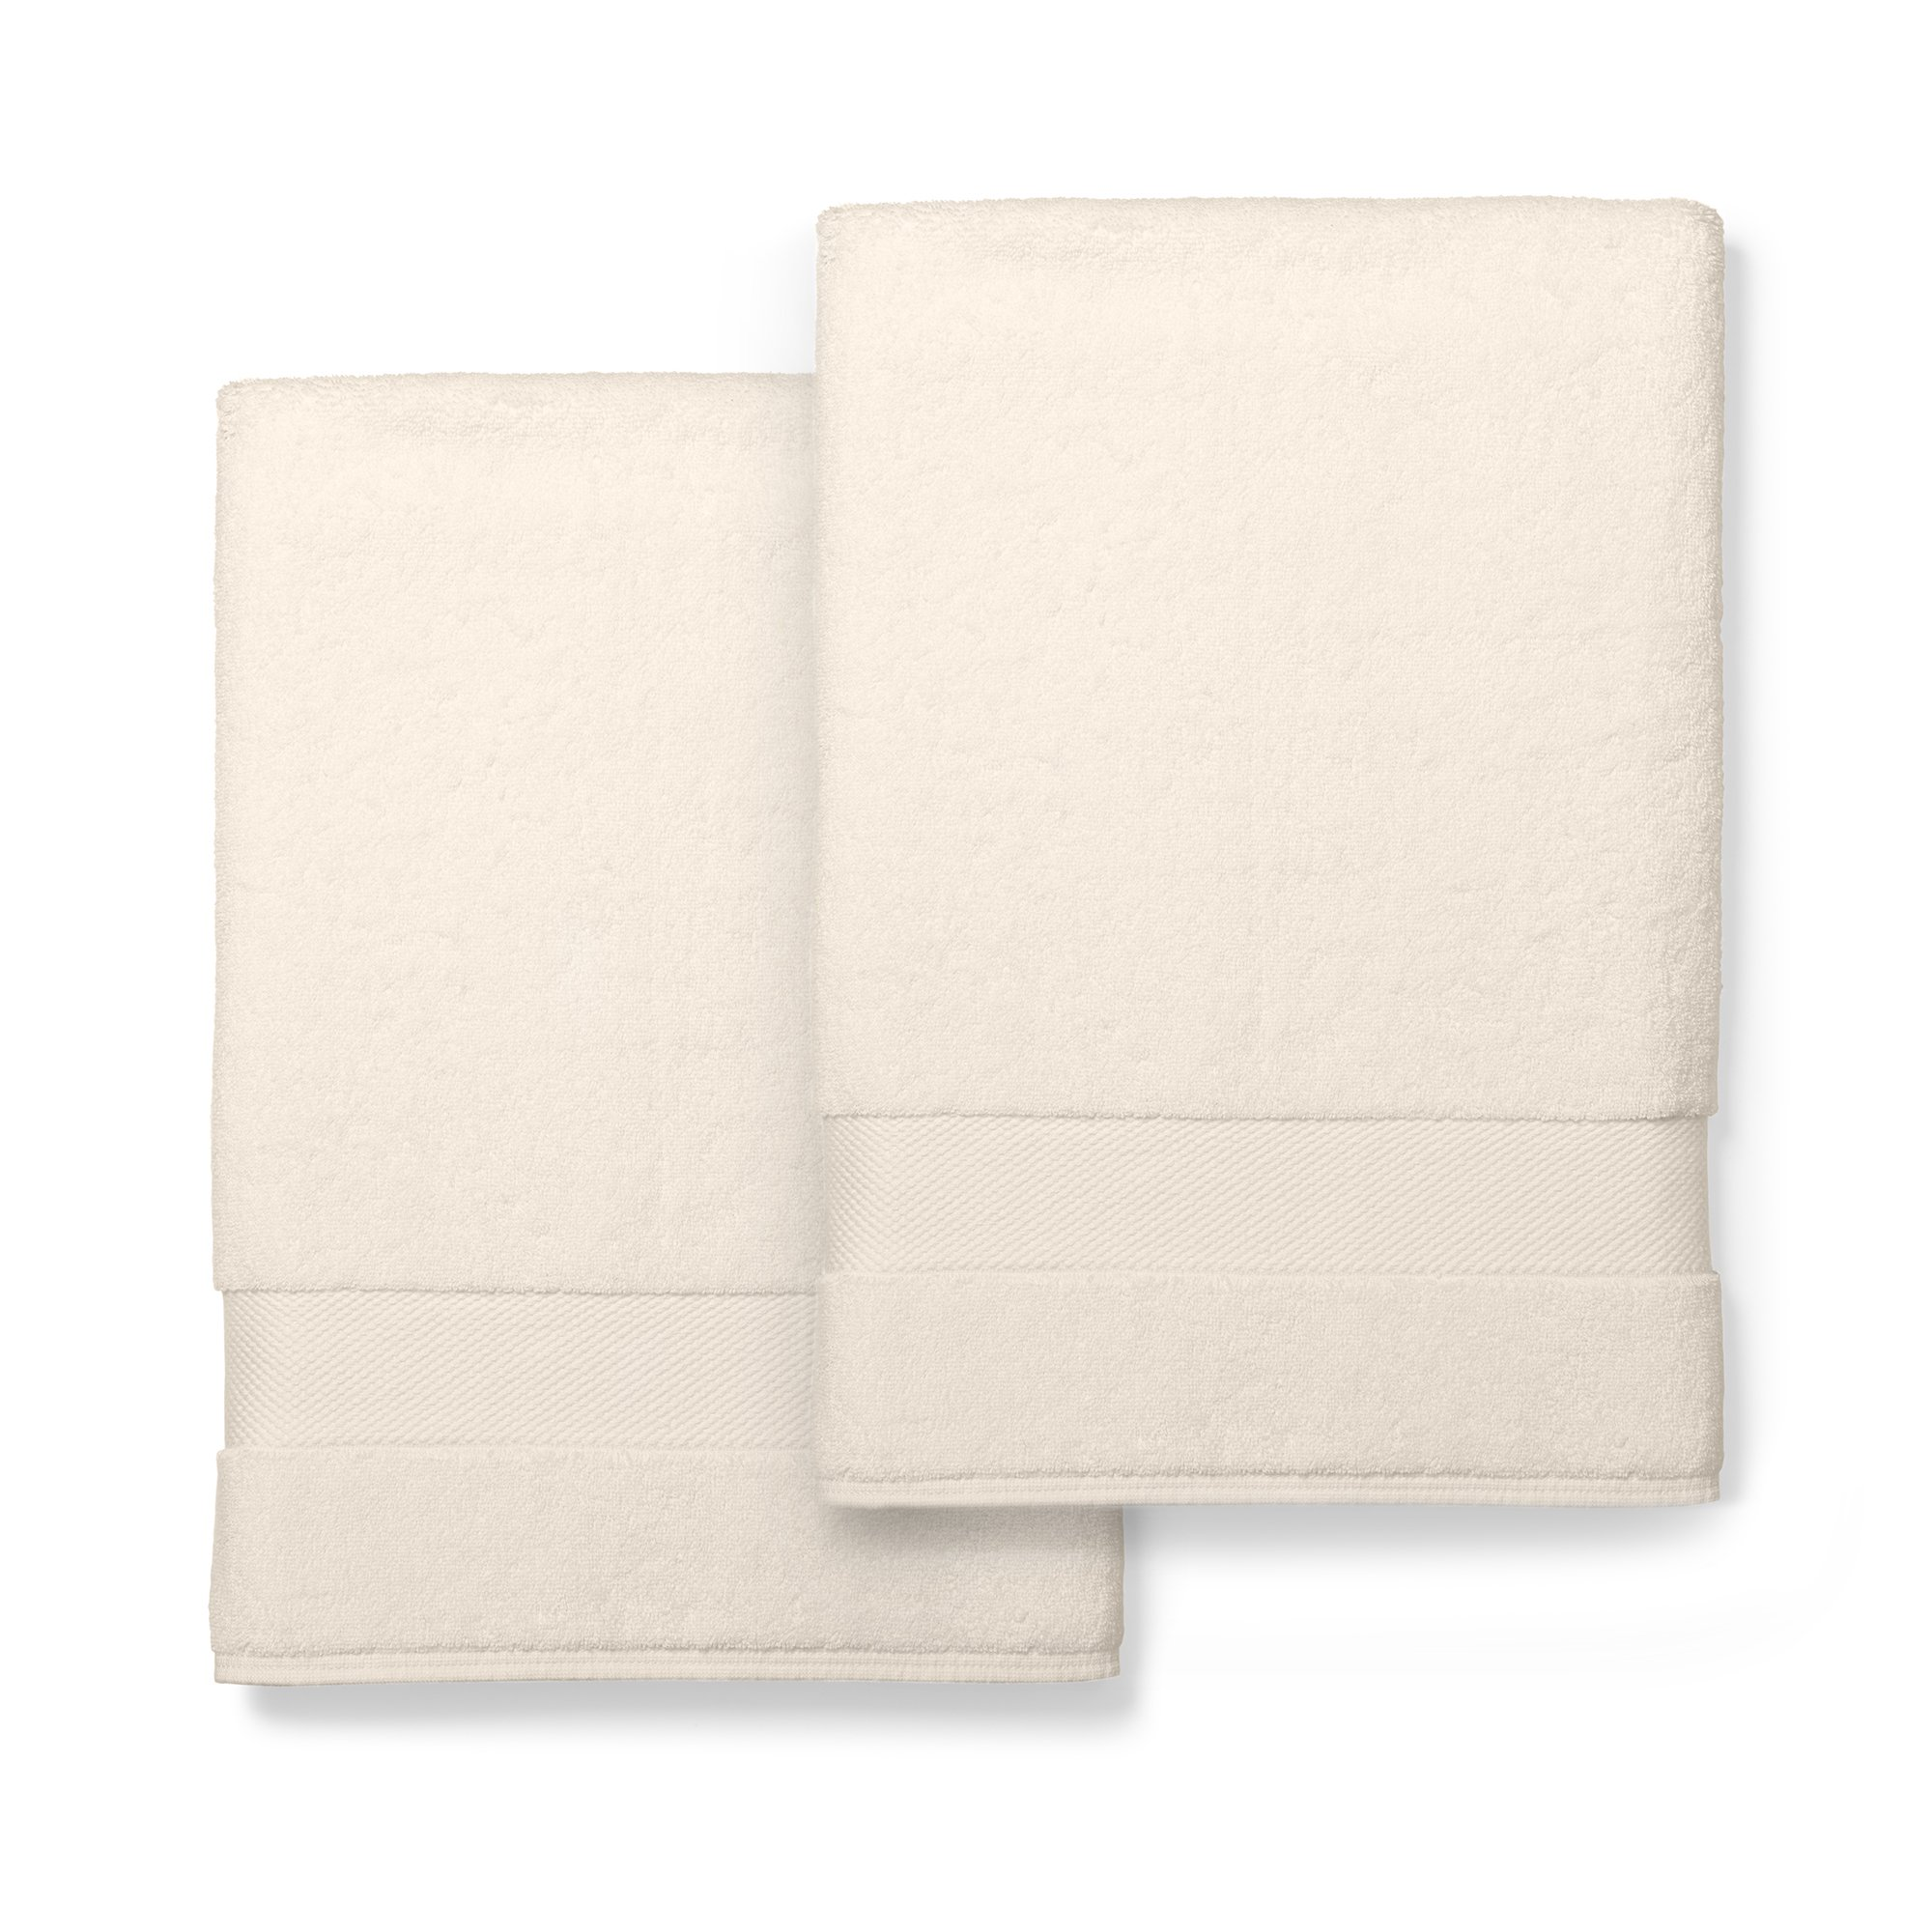 Boll & Branch Luxury Bath Sheets | Fair Trade Organic Cotton Large Bath Towels | Natural, 2 Pack